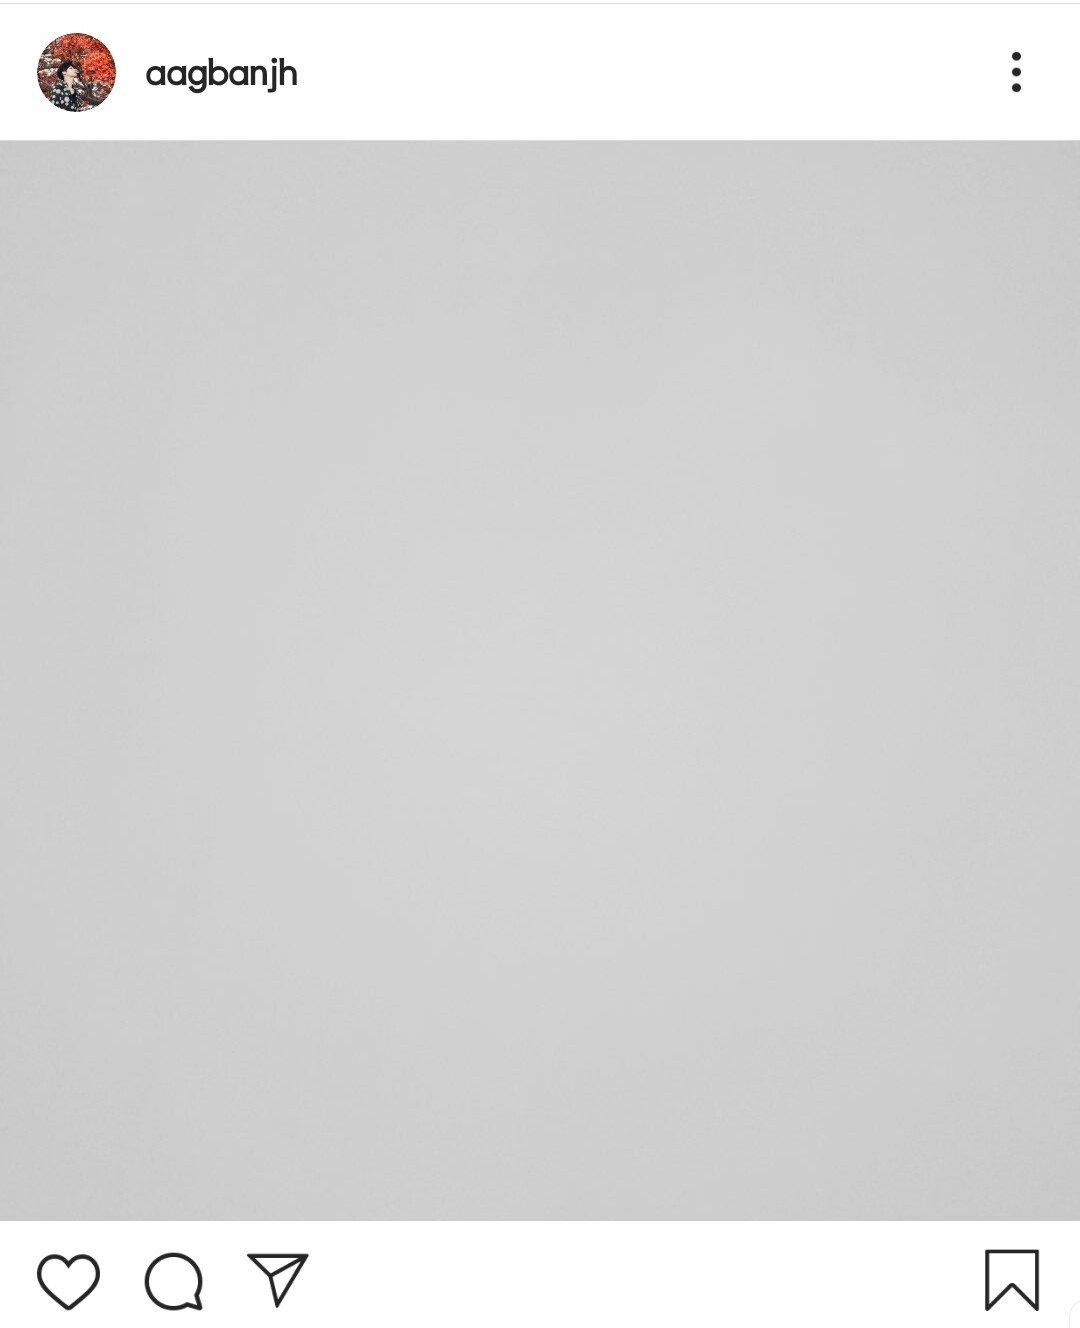 SmartSelect_20190821-203922_Instagram.jpg 방금 올라온 안재현 인스타 글